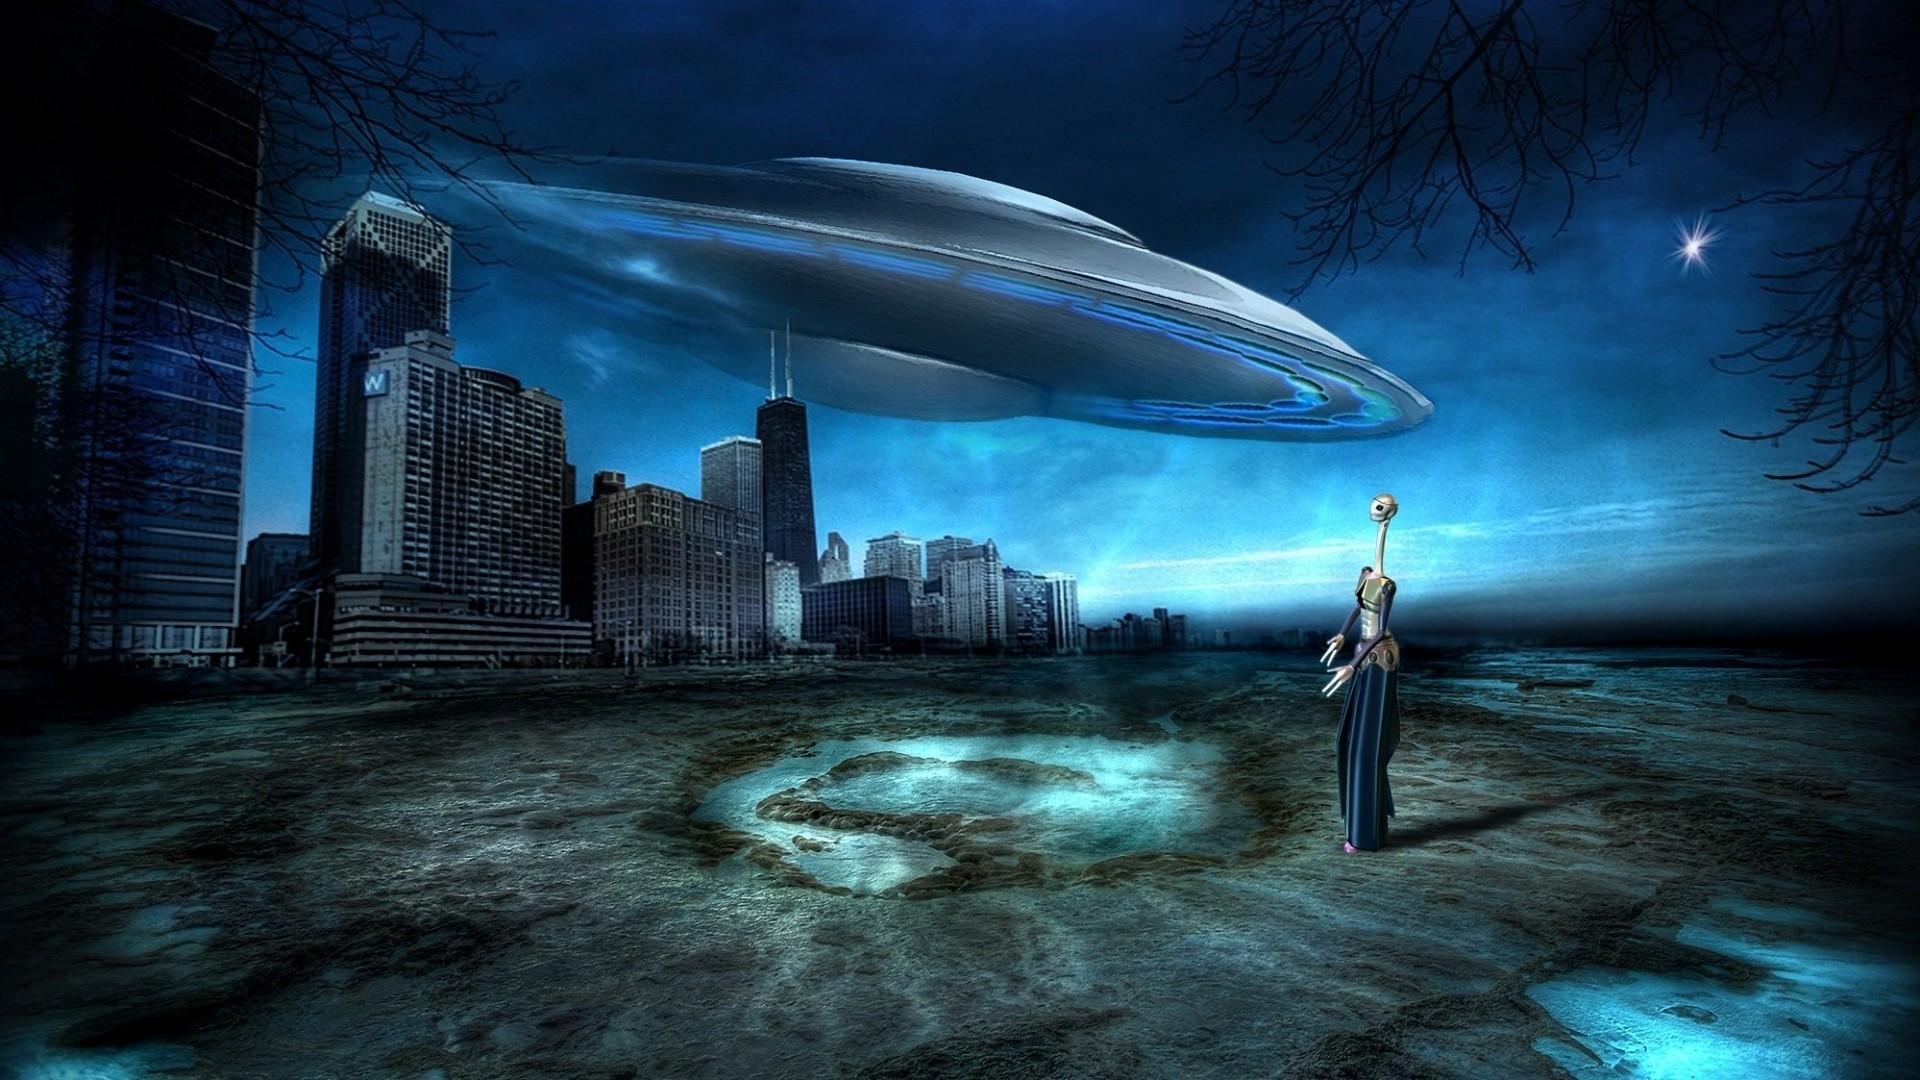 Ufo Wallpaper image hd